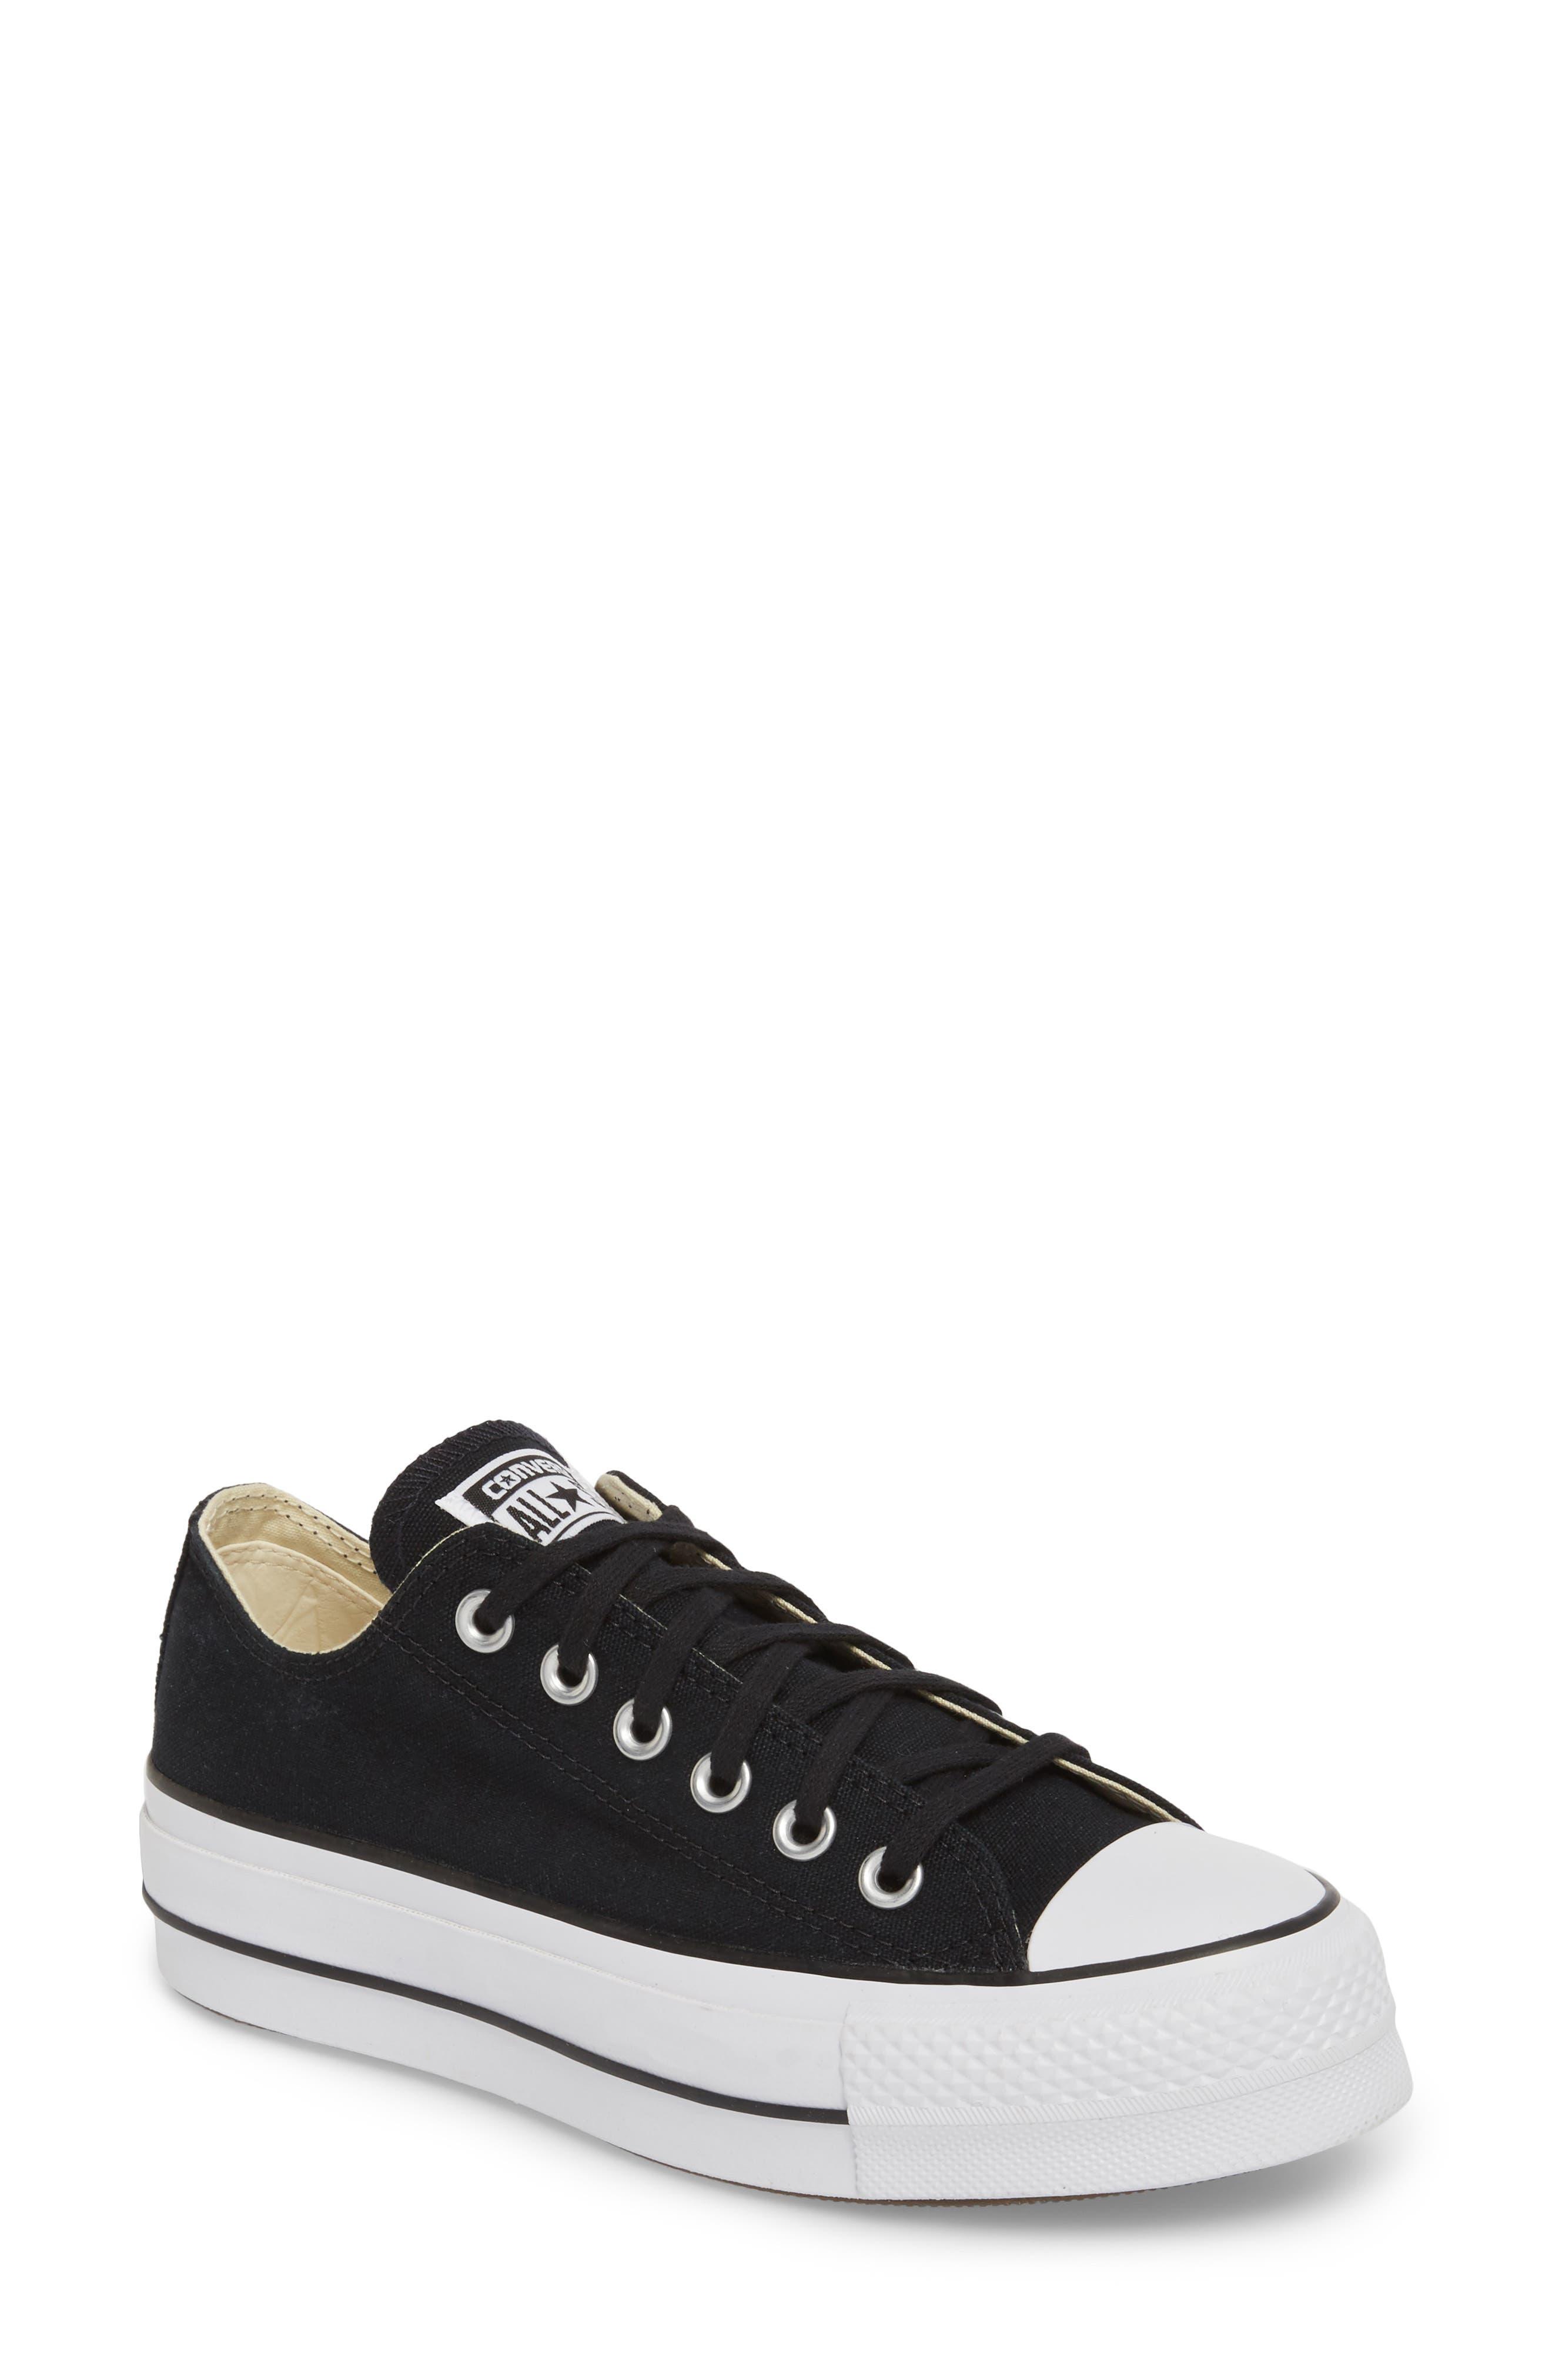 ,                             Chuck Taylor<sup>®</sup> All Star<sup>®</sup> Platform Sneaker,                             Main thumbnail 1, color,                             BLACK/ WHITE/ WHITE